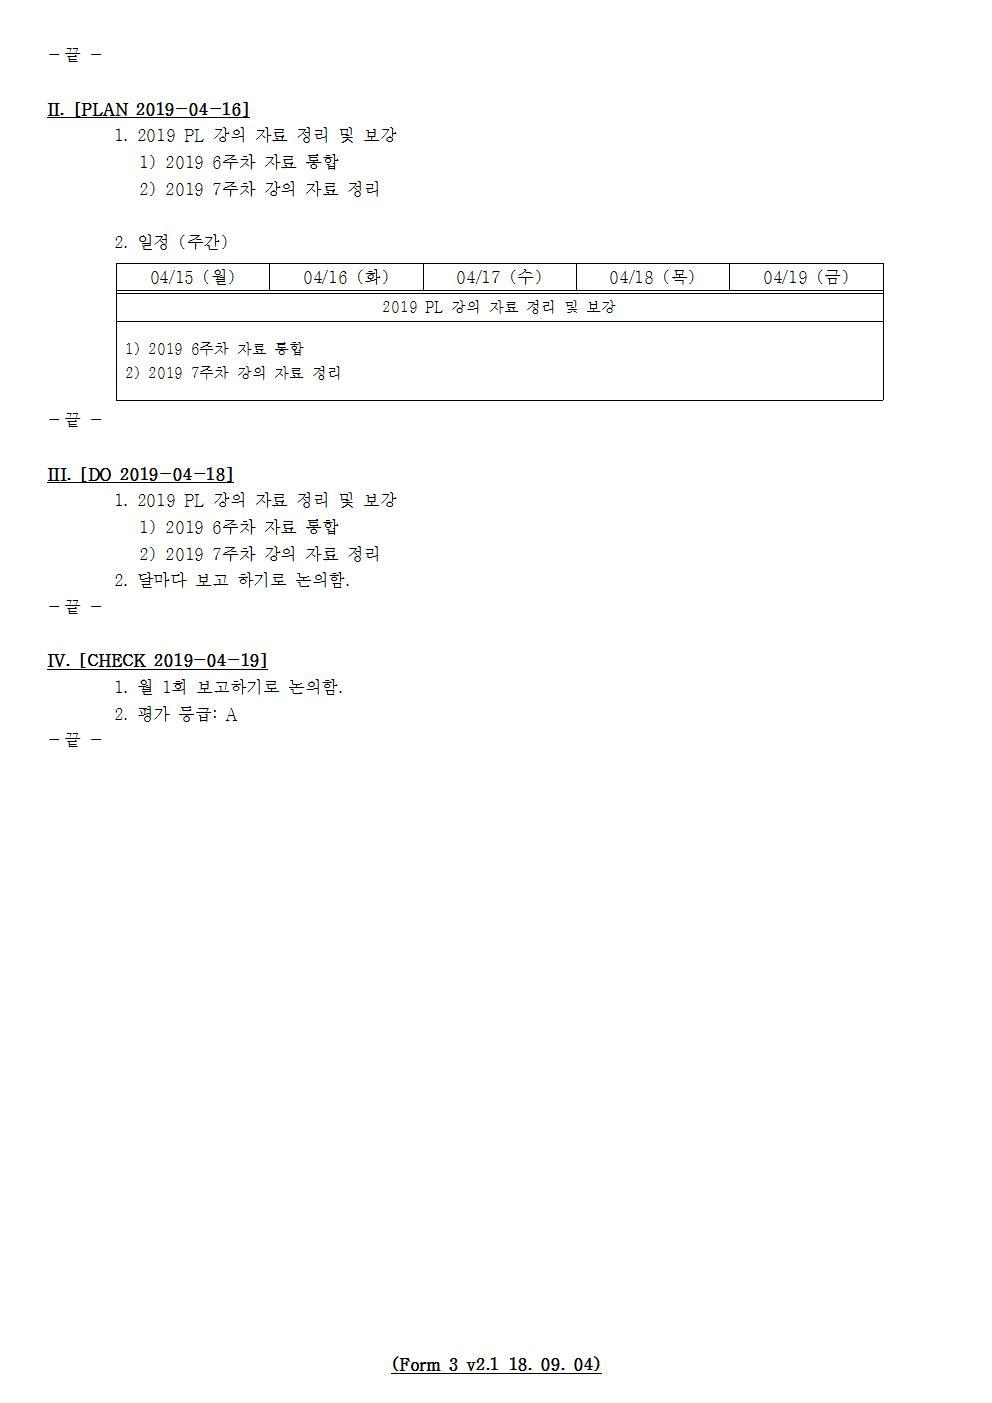 D-[19-014-PP-06]-[Book-PL]-[2019-04-19][JS]002.jpg